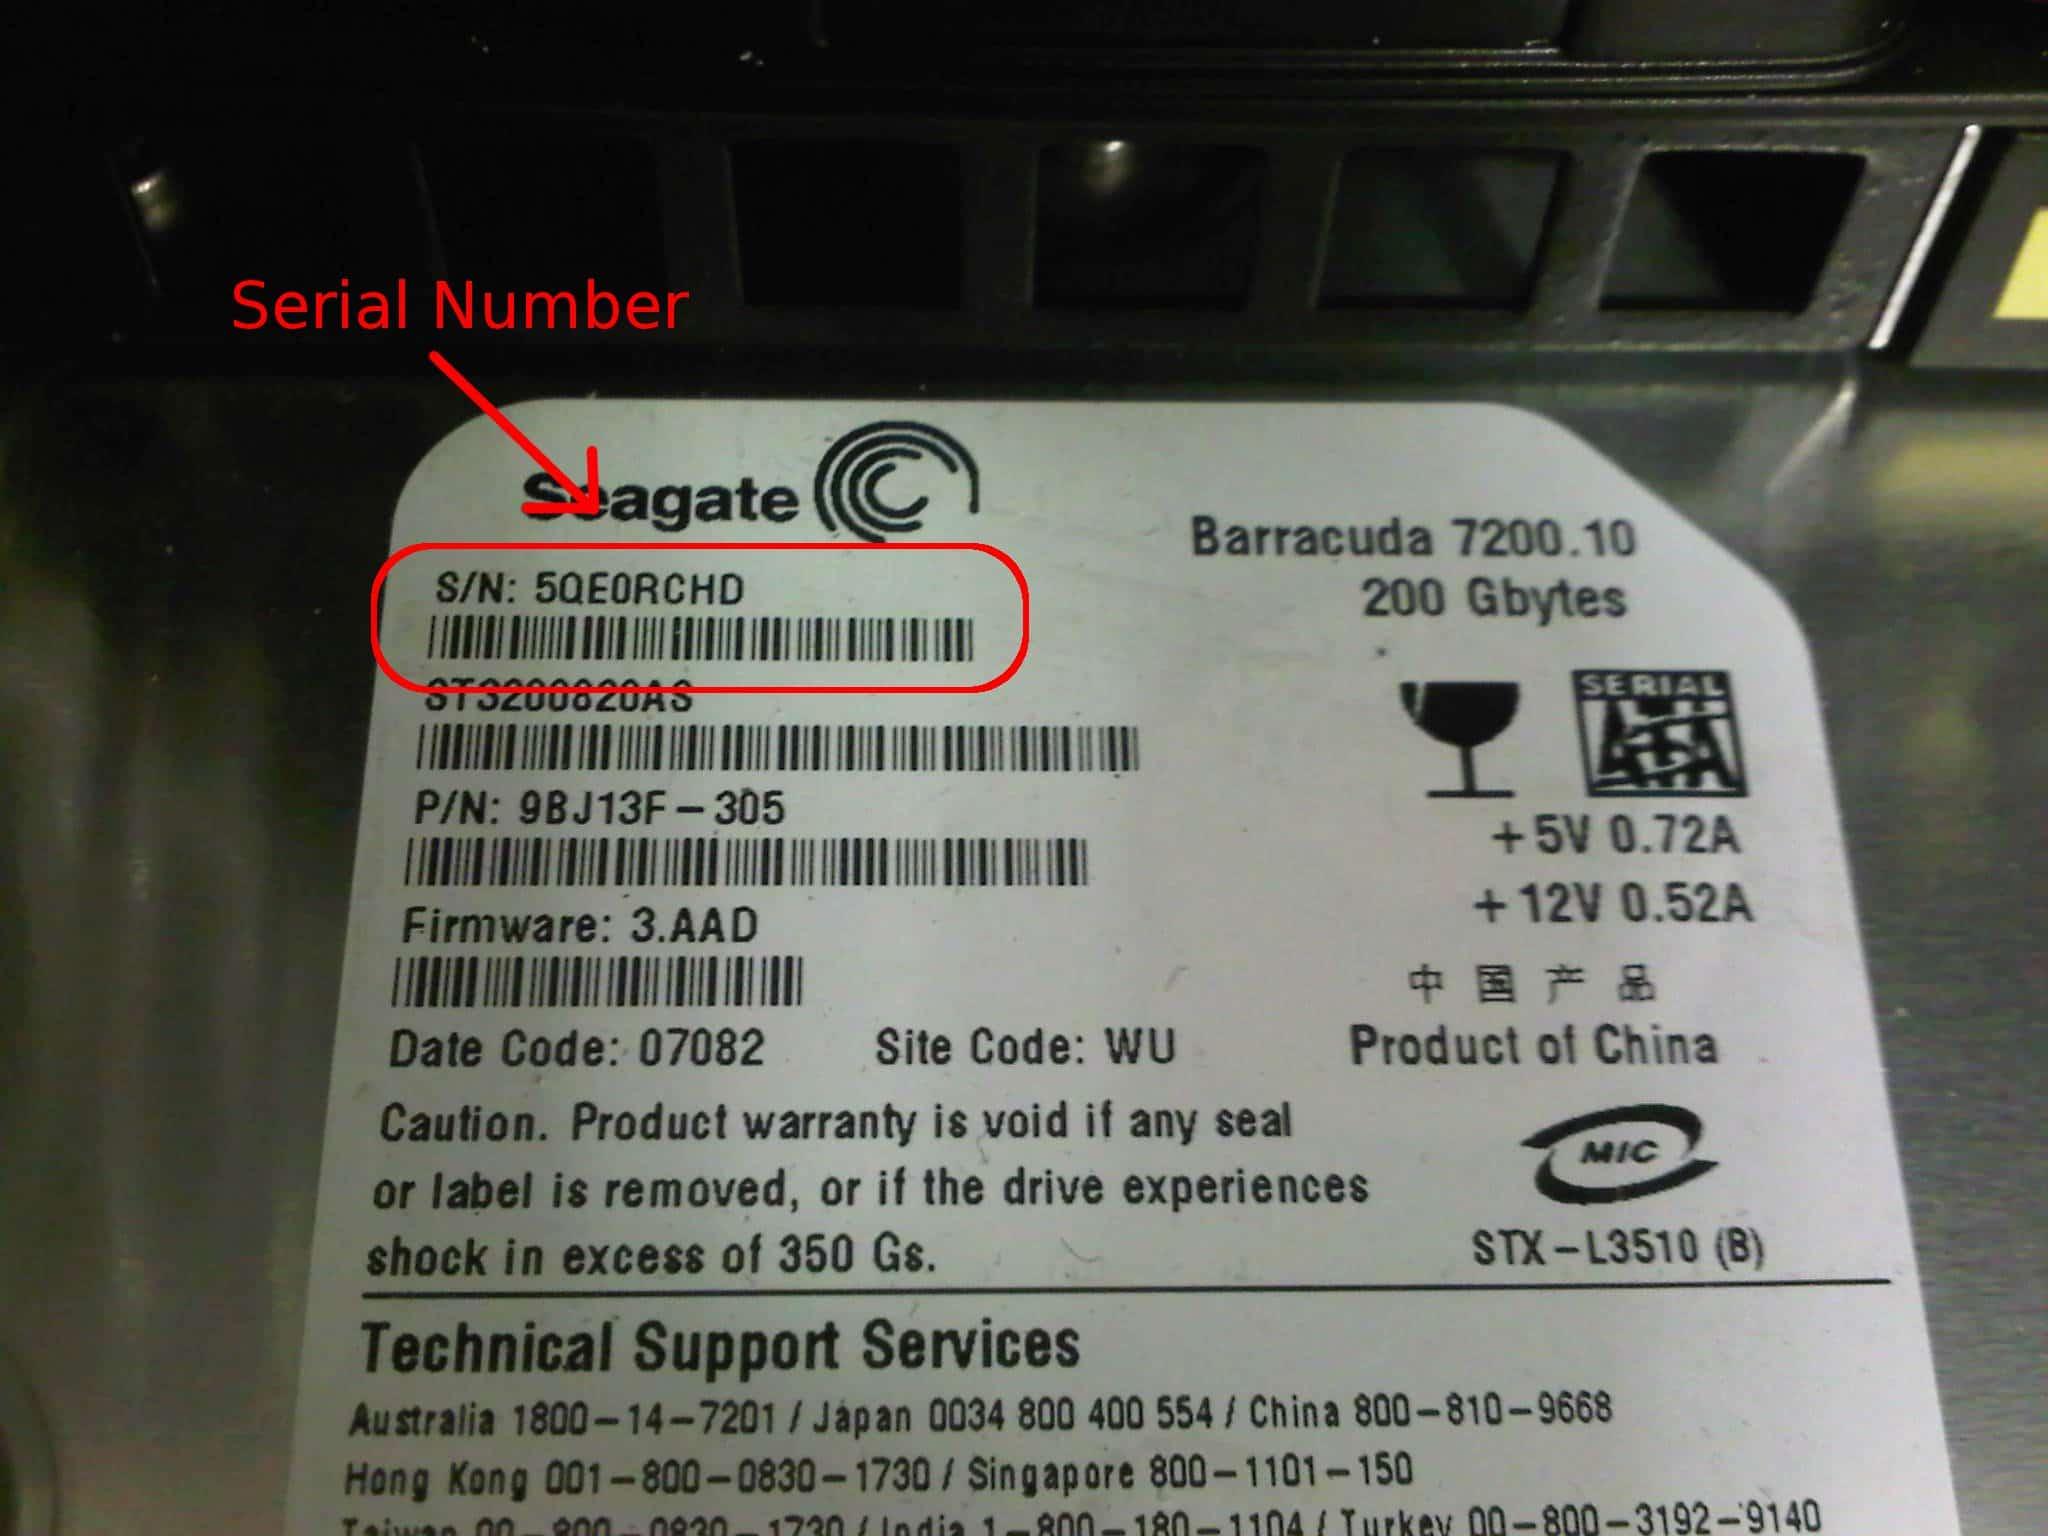 seagate barracuda serial number1